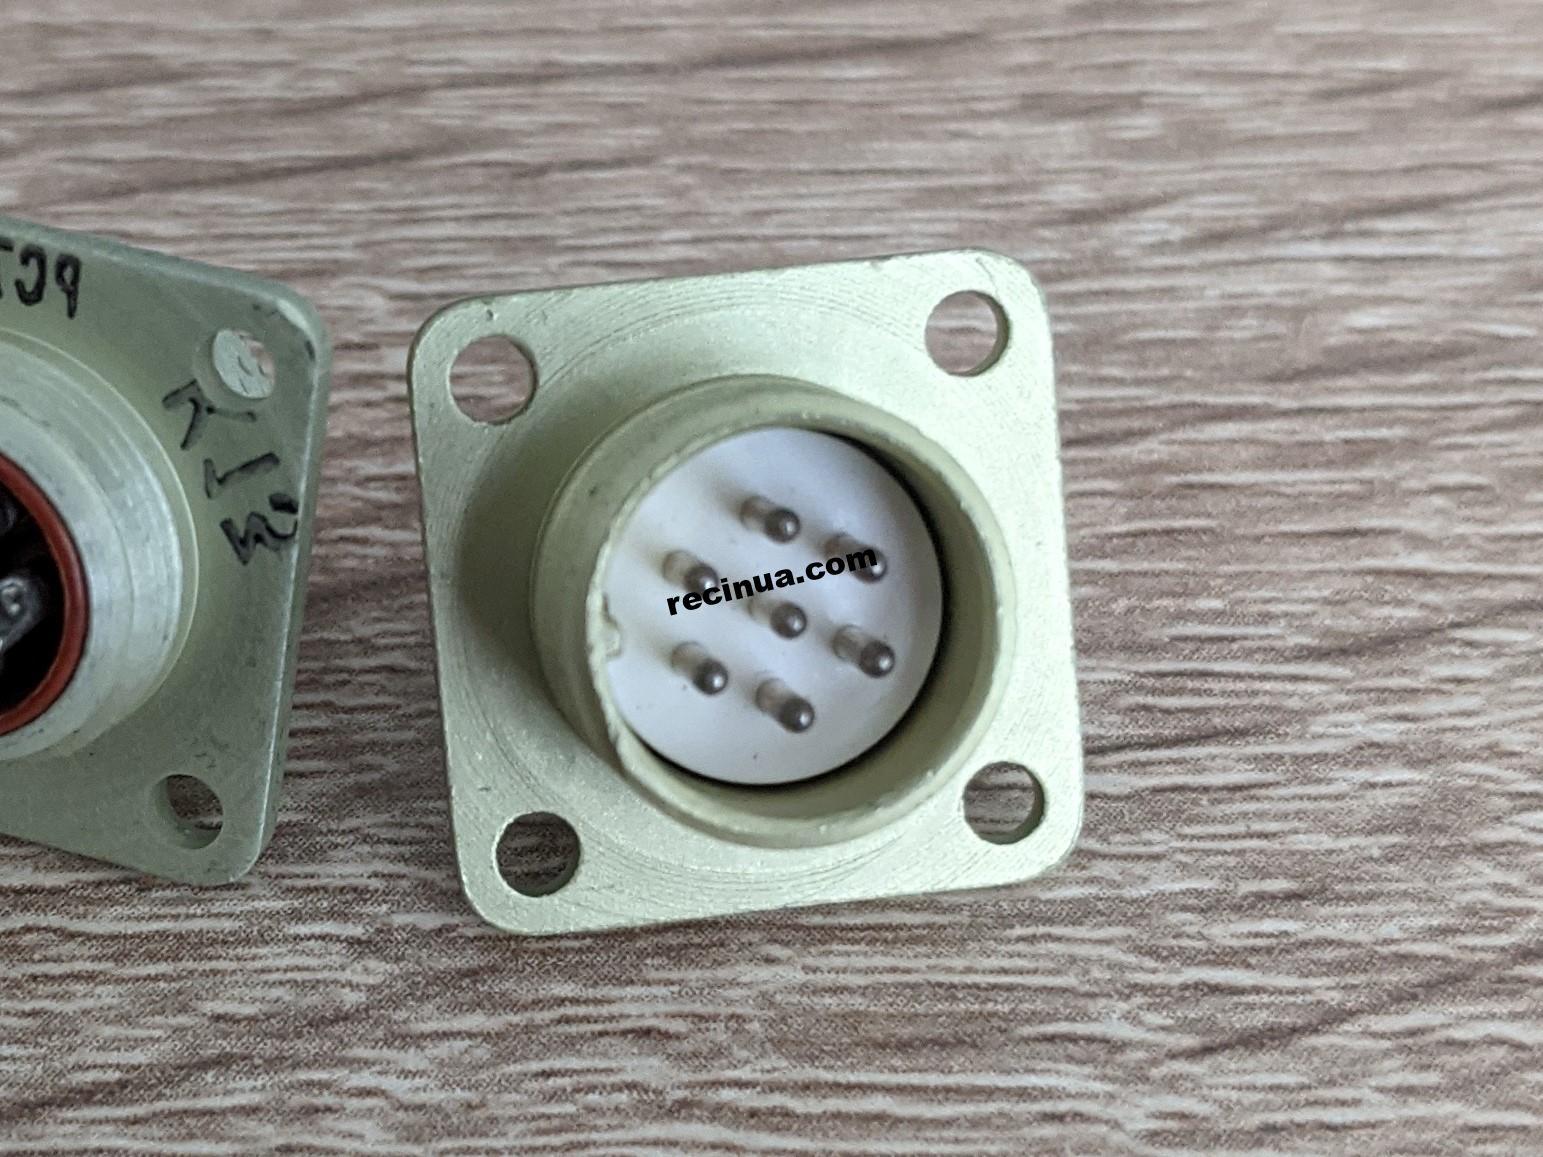 Вилка герметичная РСГ7БТВ без кожуха